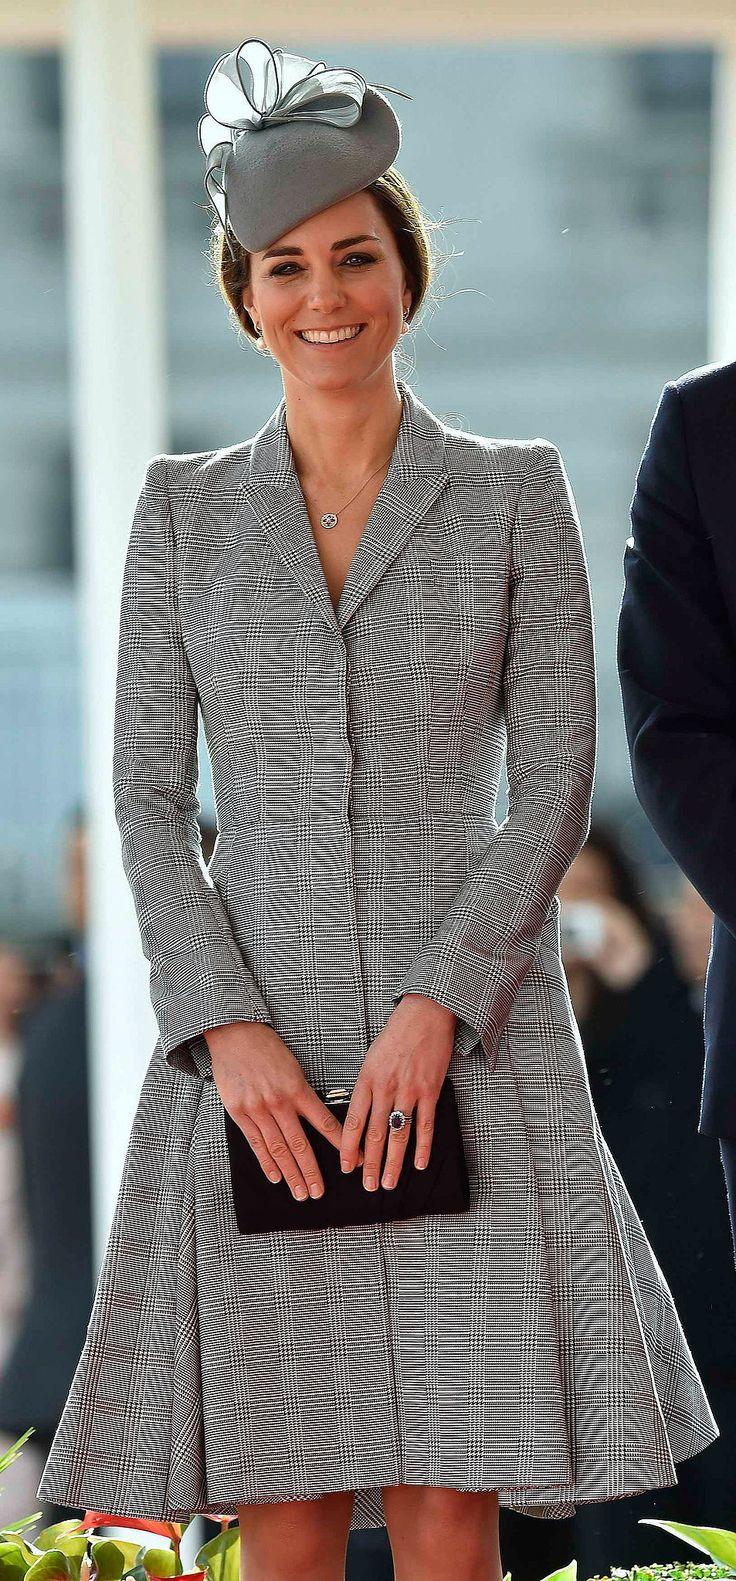 Pregnant Kate Middleton in Alexander McQueen